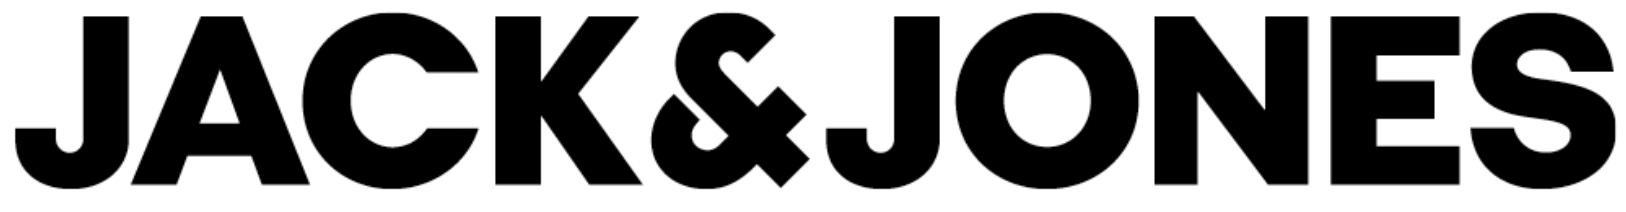 Jack and jones